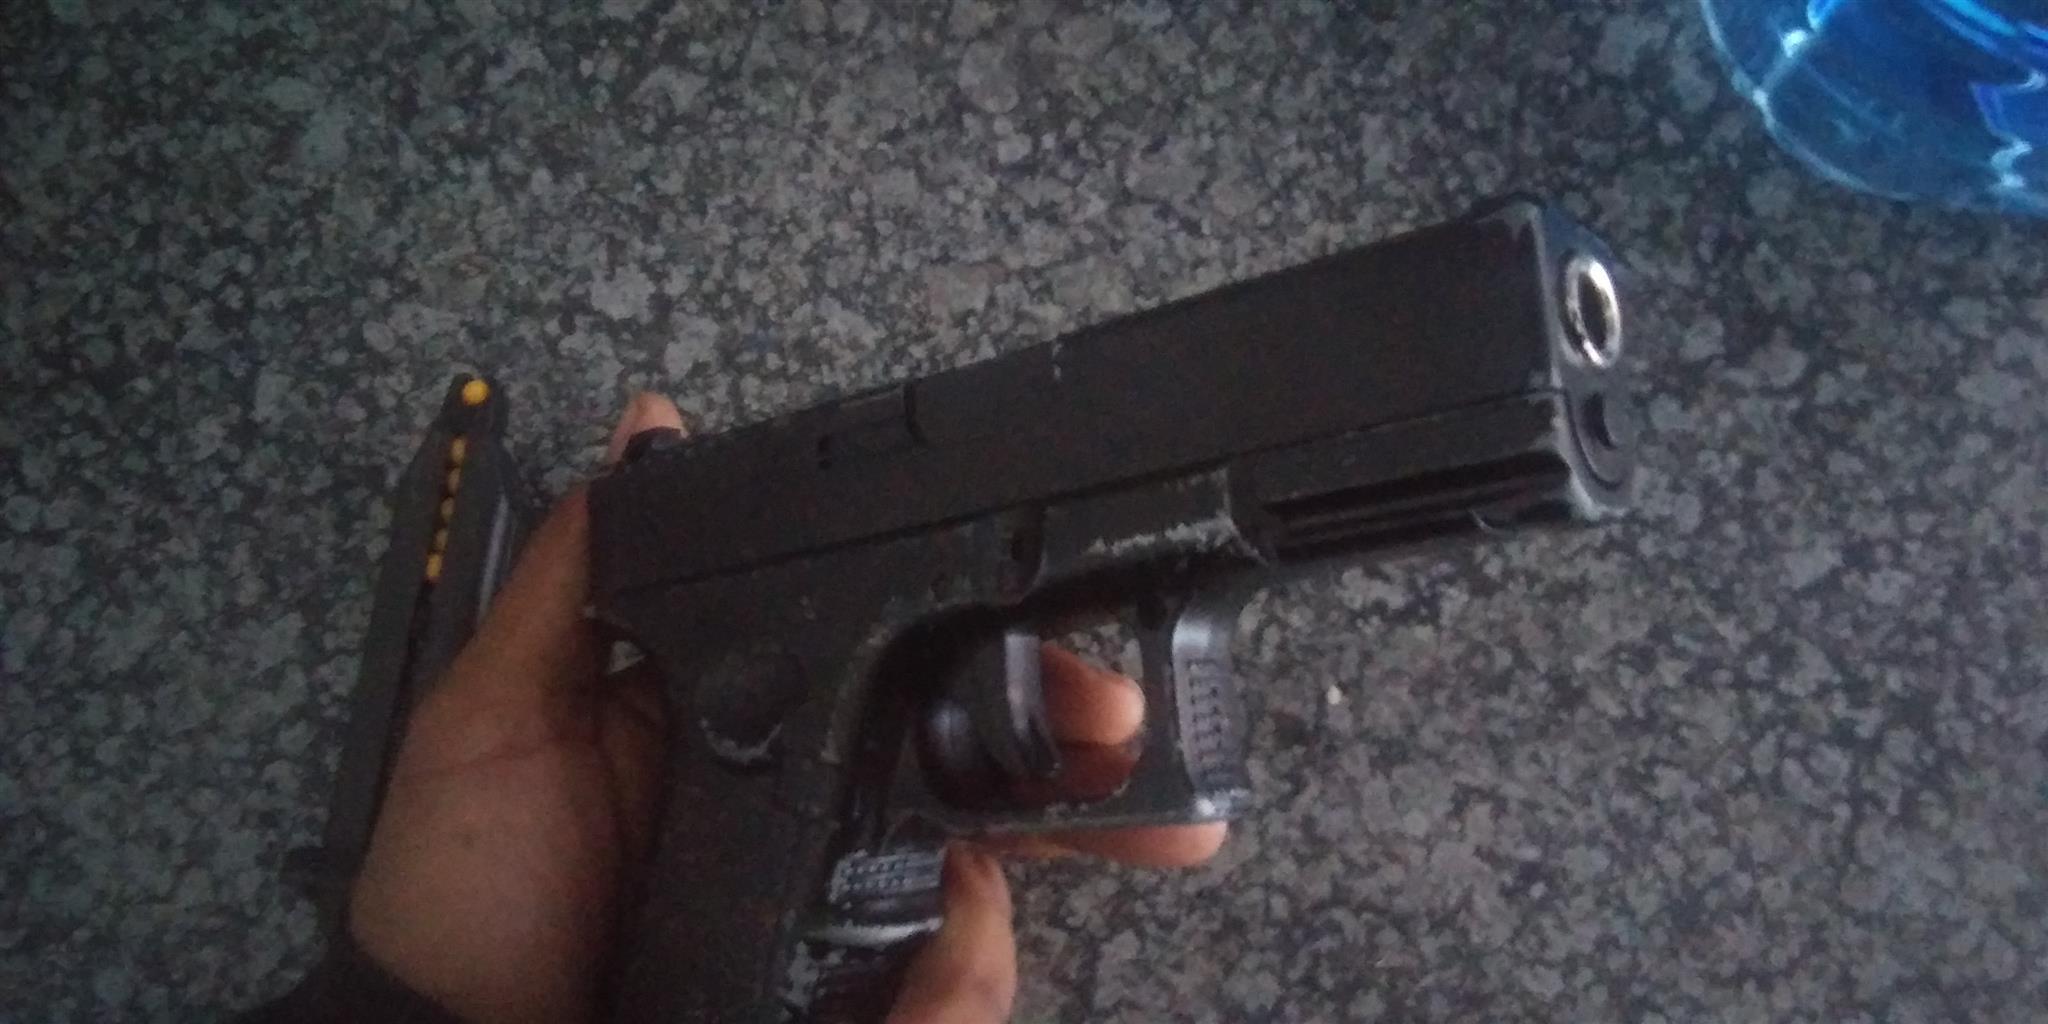 AIRSOFT SPRING GUN